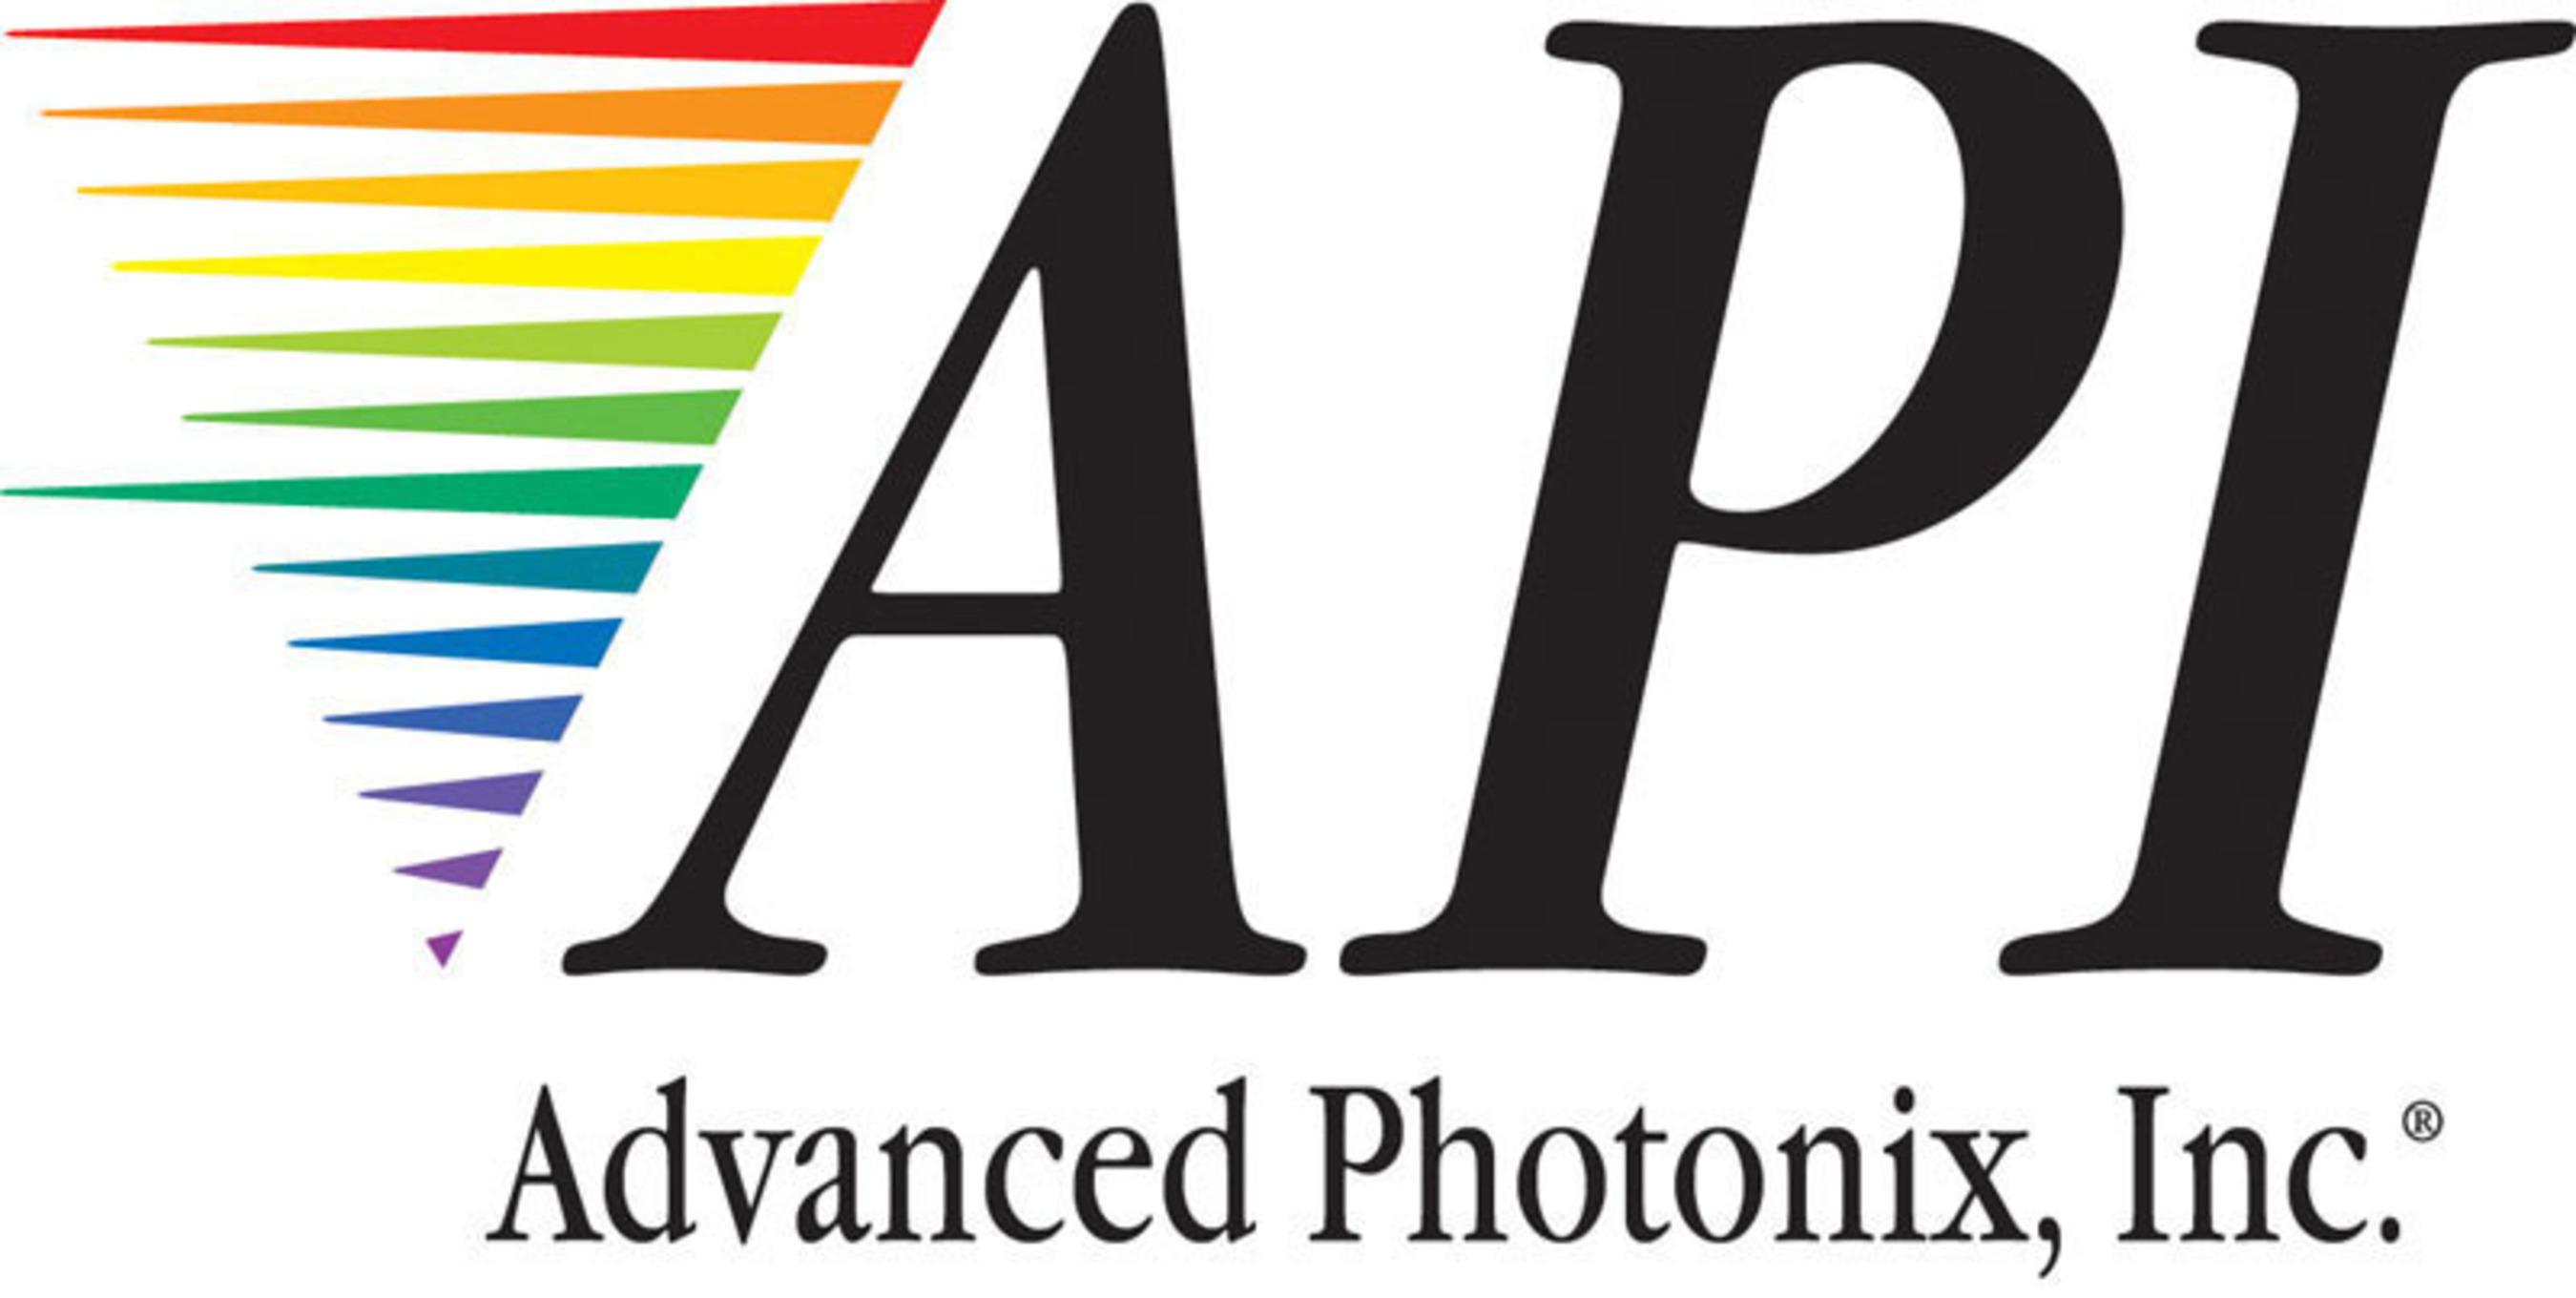 Advanced Photonix, Inc.